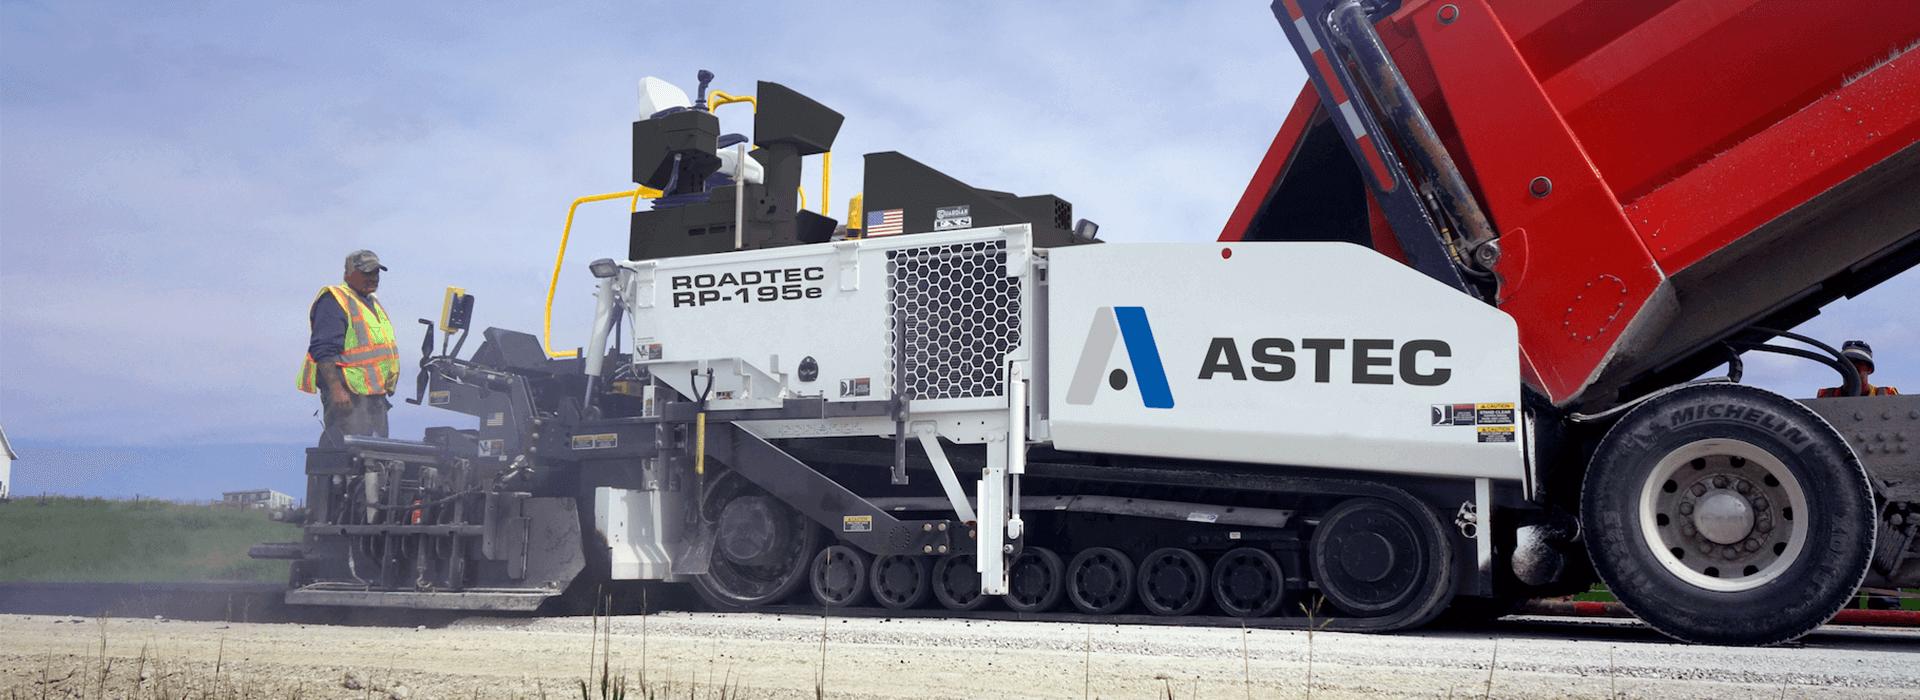 Roadtec RP-195 highway class asphalt paver paving with a dump truck